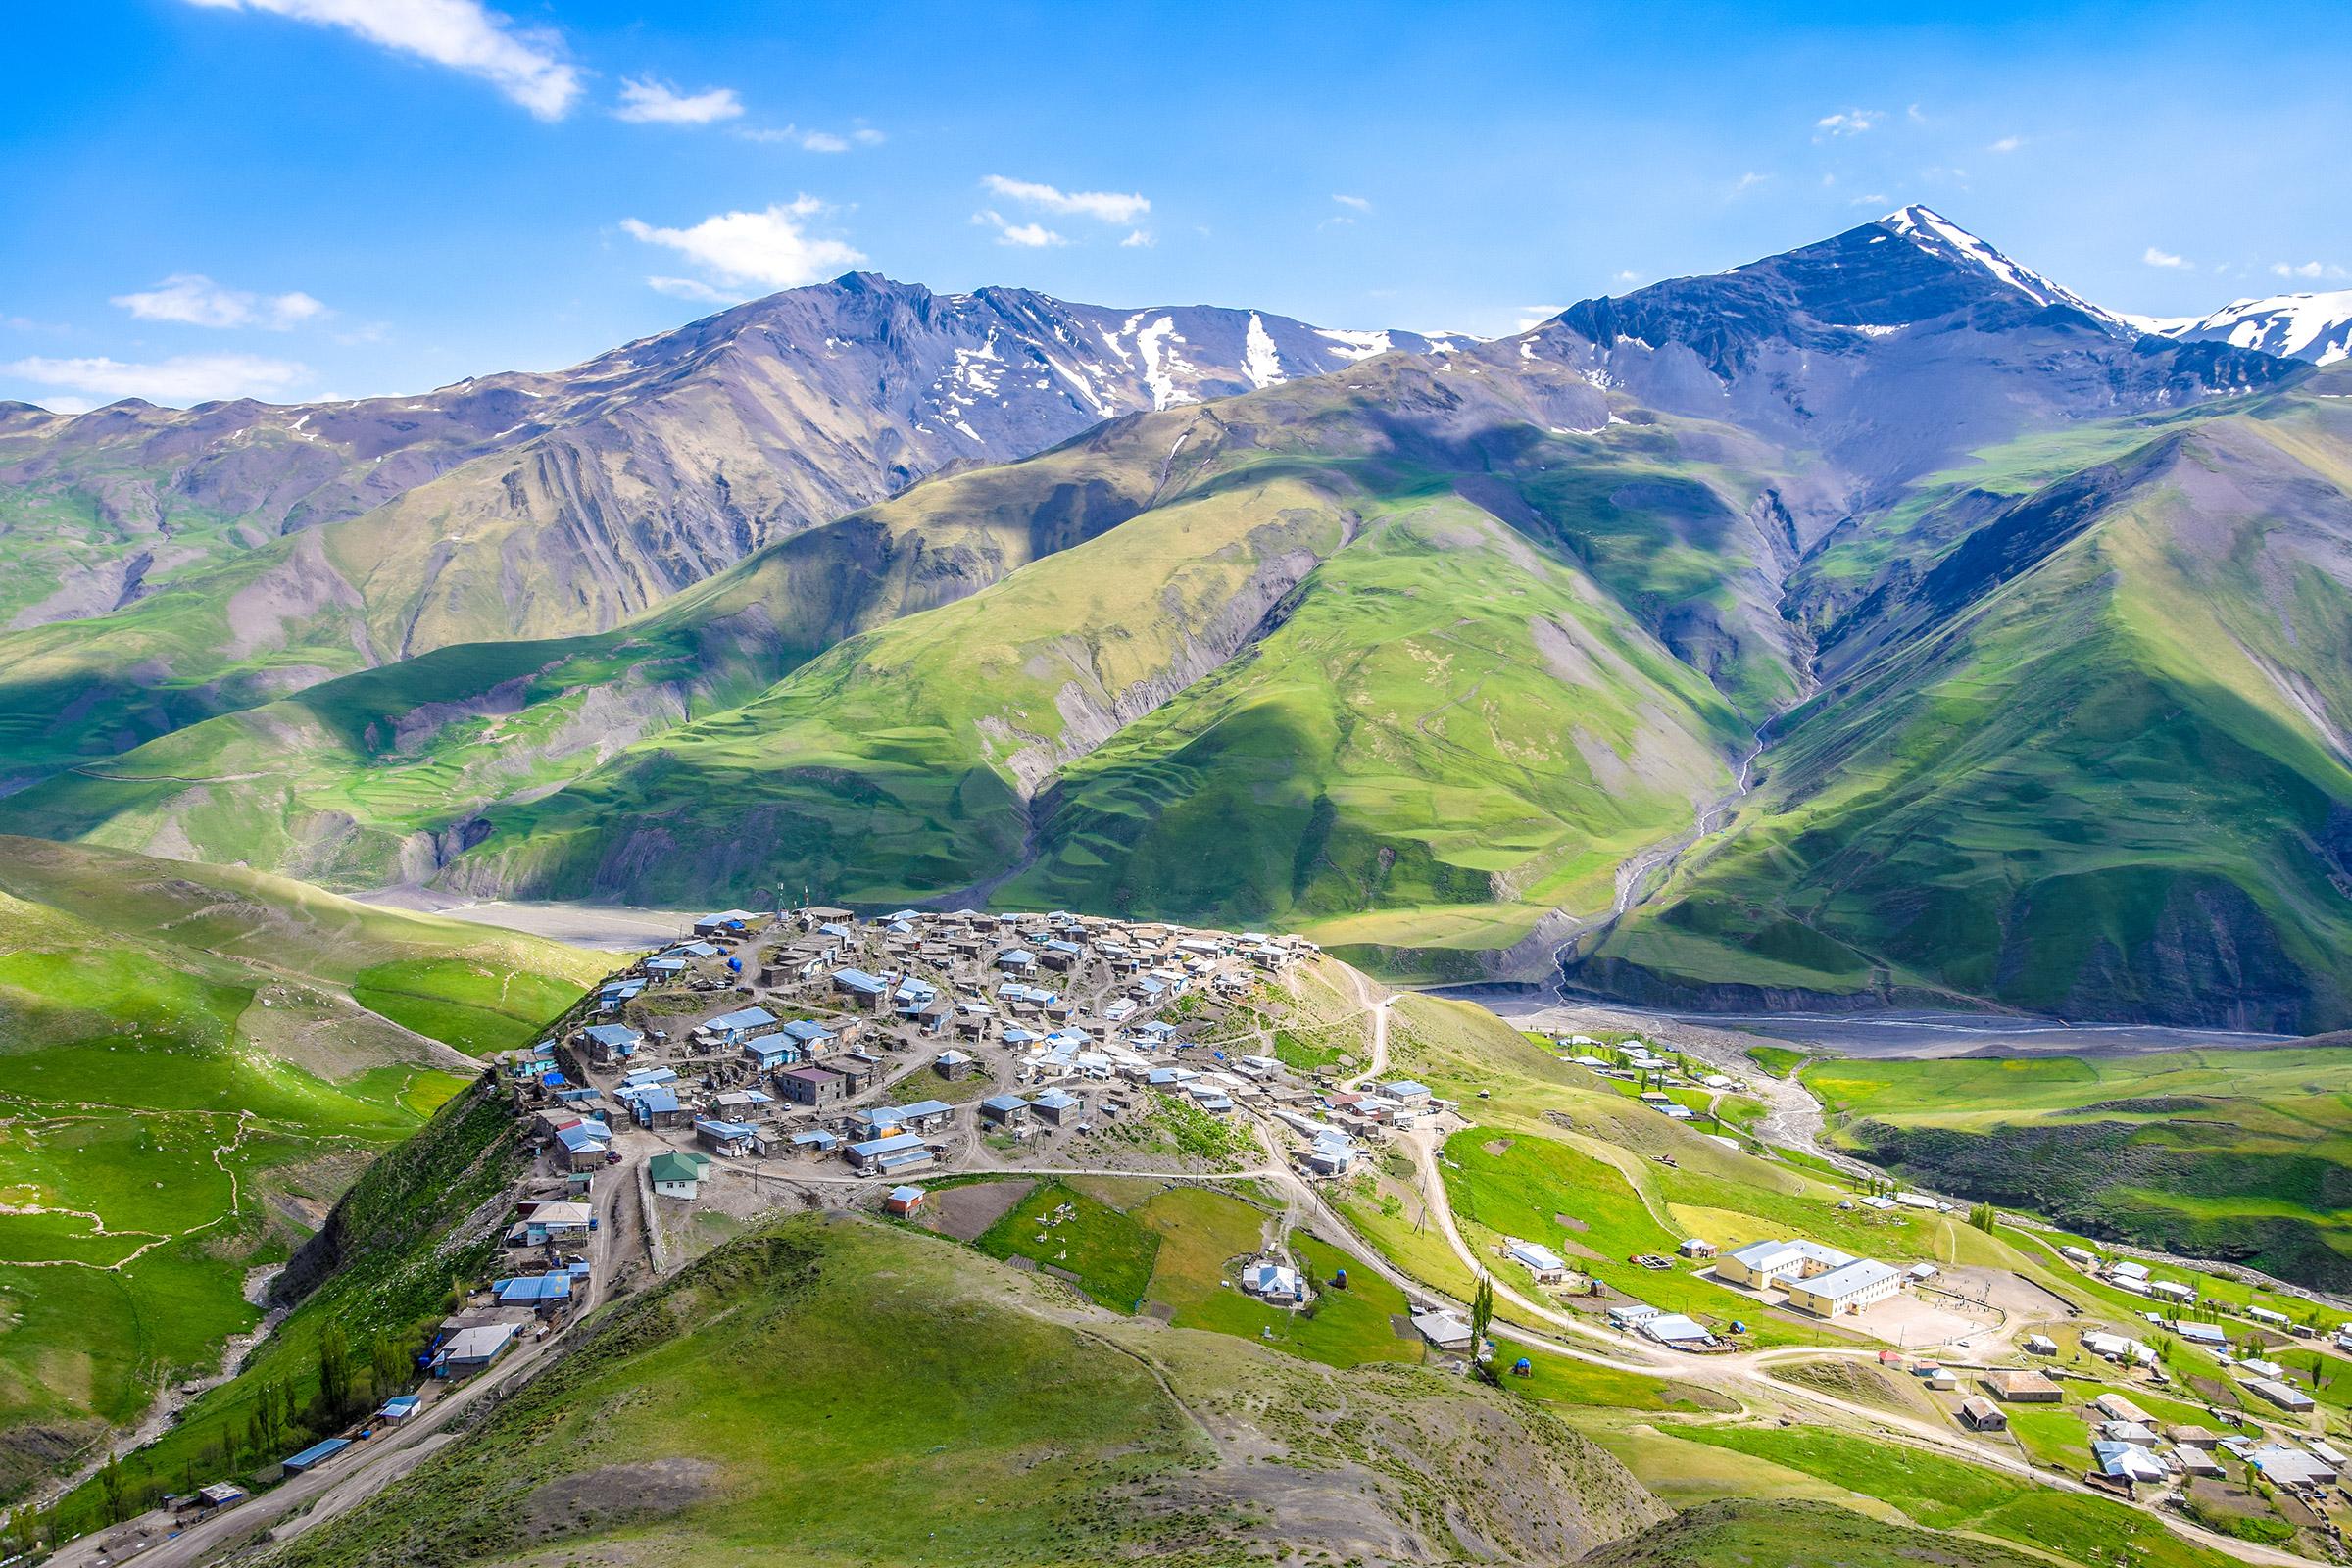 Azerbaijan Caucasus Mountains Xinaliq